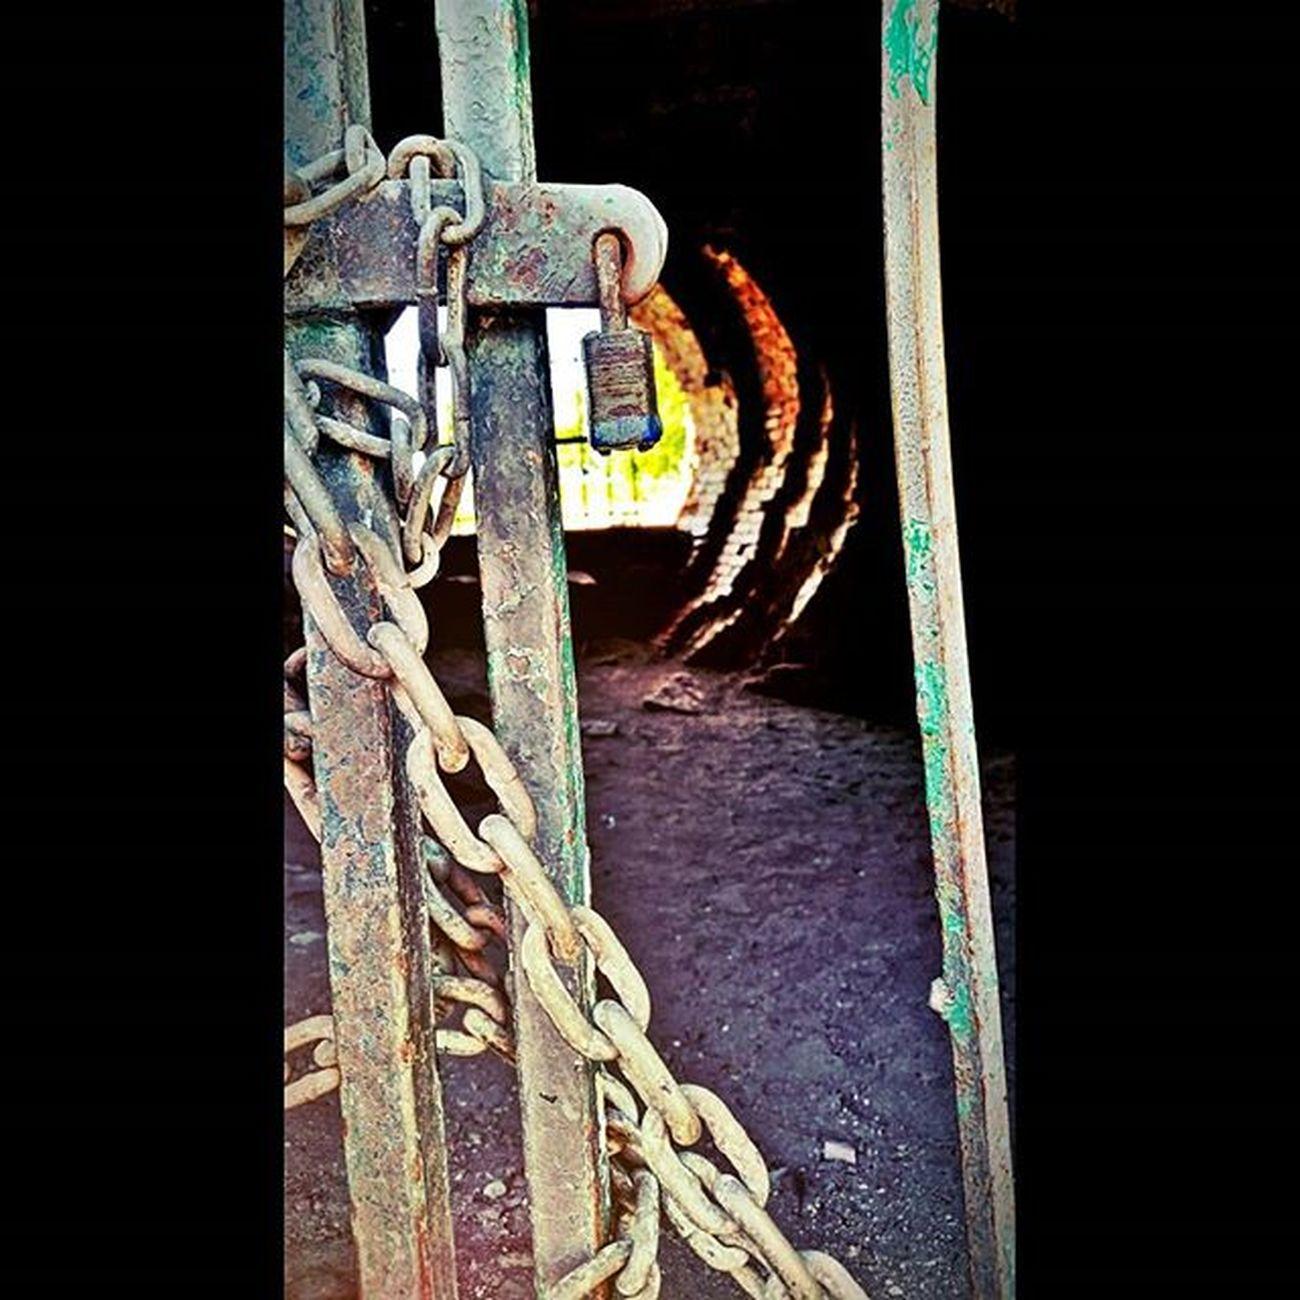 Siouxfalls Southdakota Fallspark Chains lockedout tunnel lightattheendofthetunnel noentry rustedgate gates picoftheday perspective beautyiseverywhere favoriteplaces behindcloseddoors pixlr seenthru